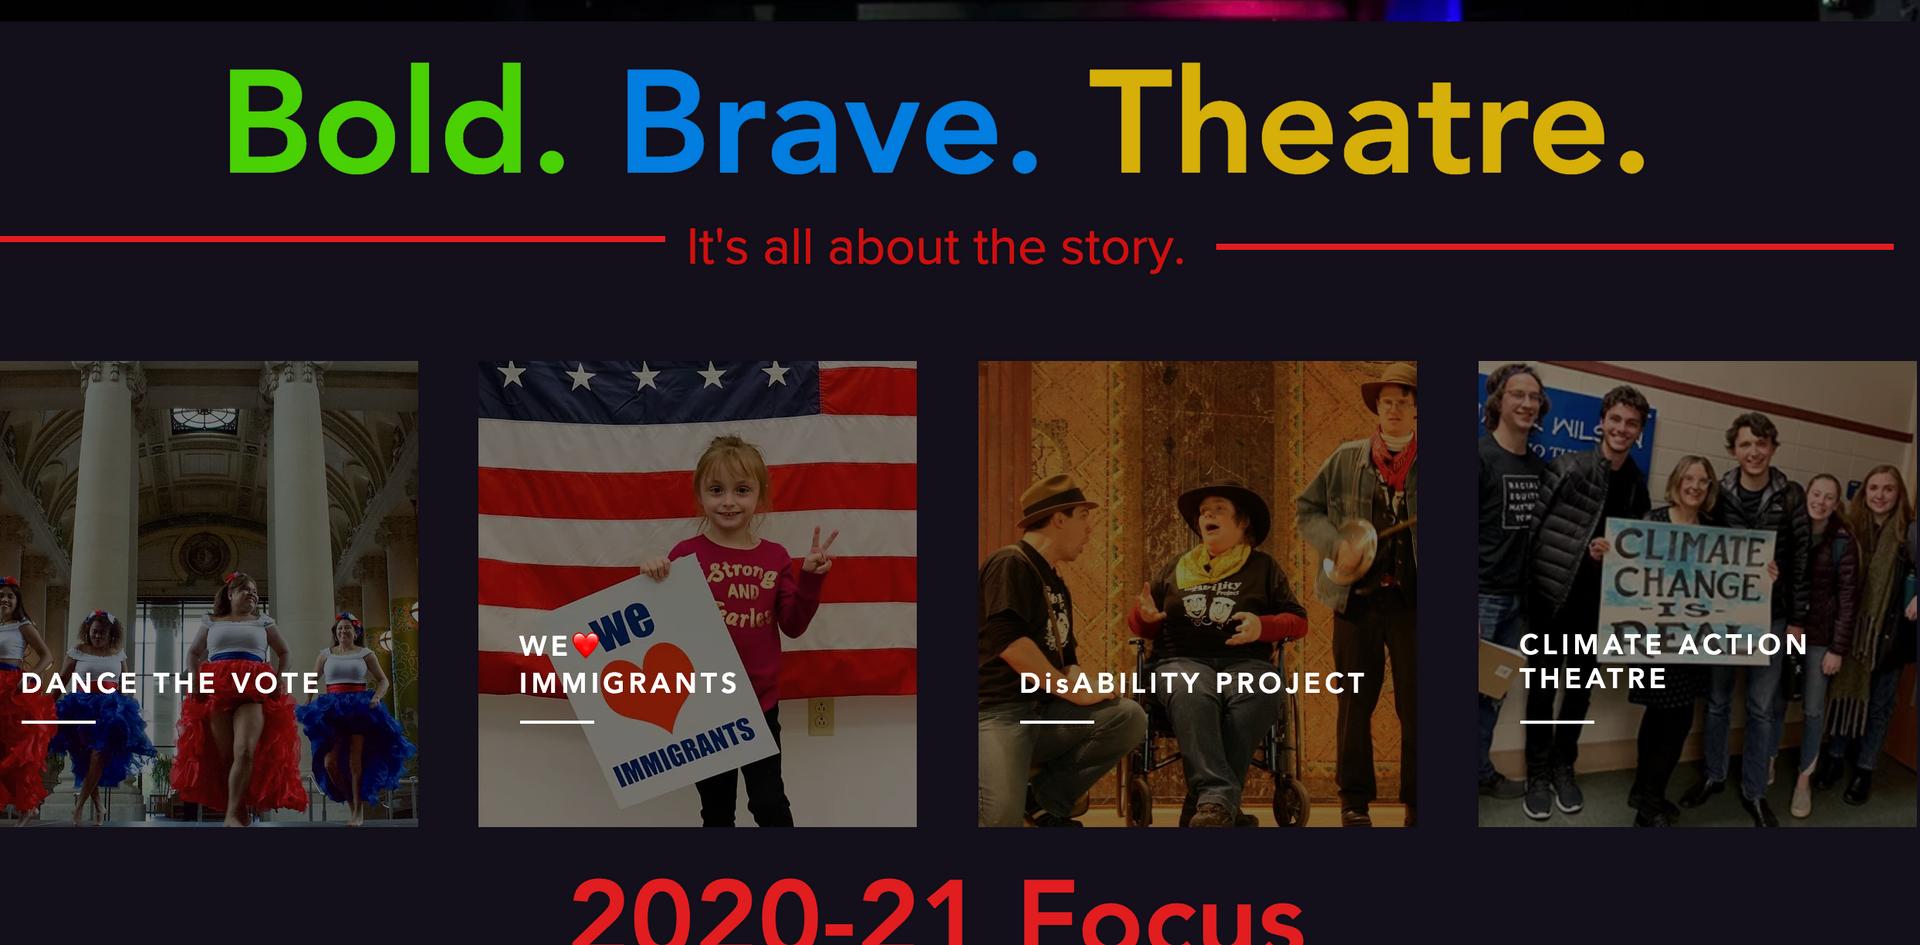 That Uppity Theatre Company Statements